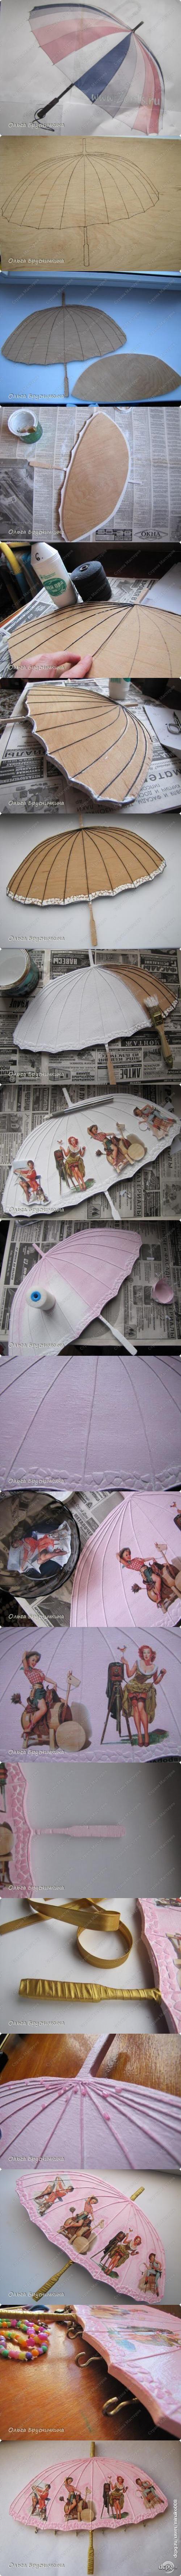 Декупаж - Сайт любителей декупажа - DCPG.RU   Ключница-зонтик для Барби